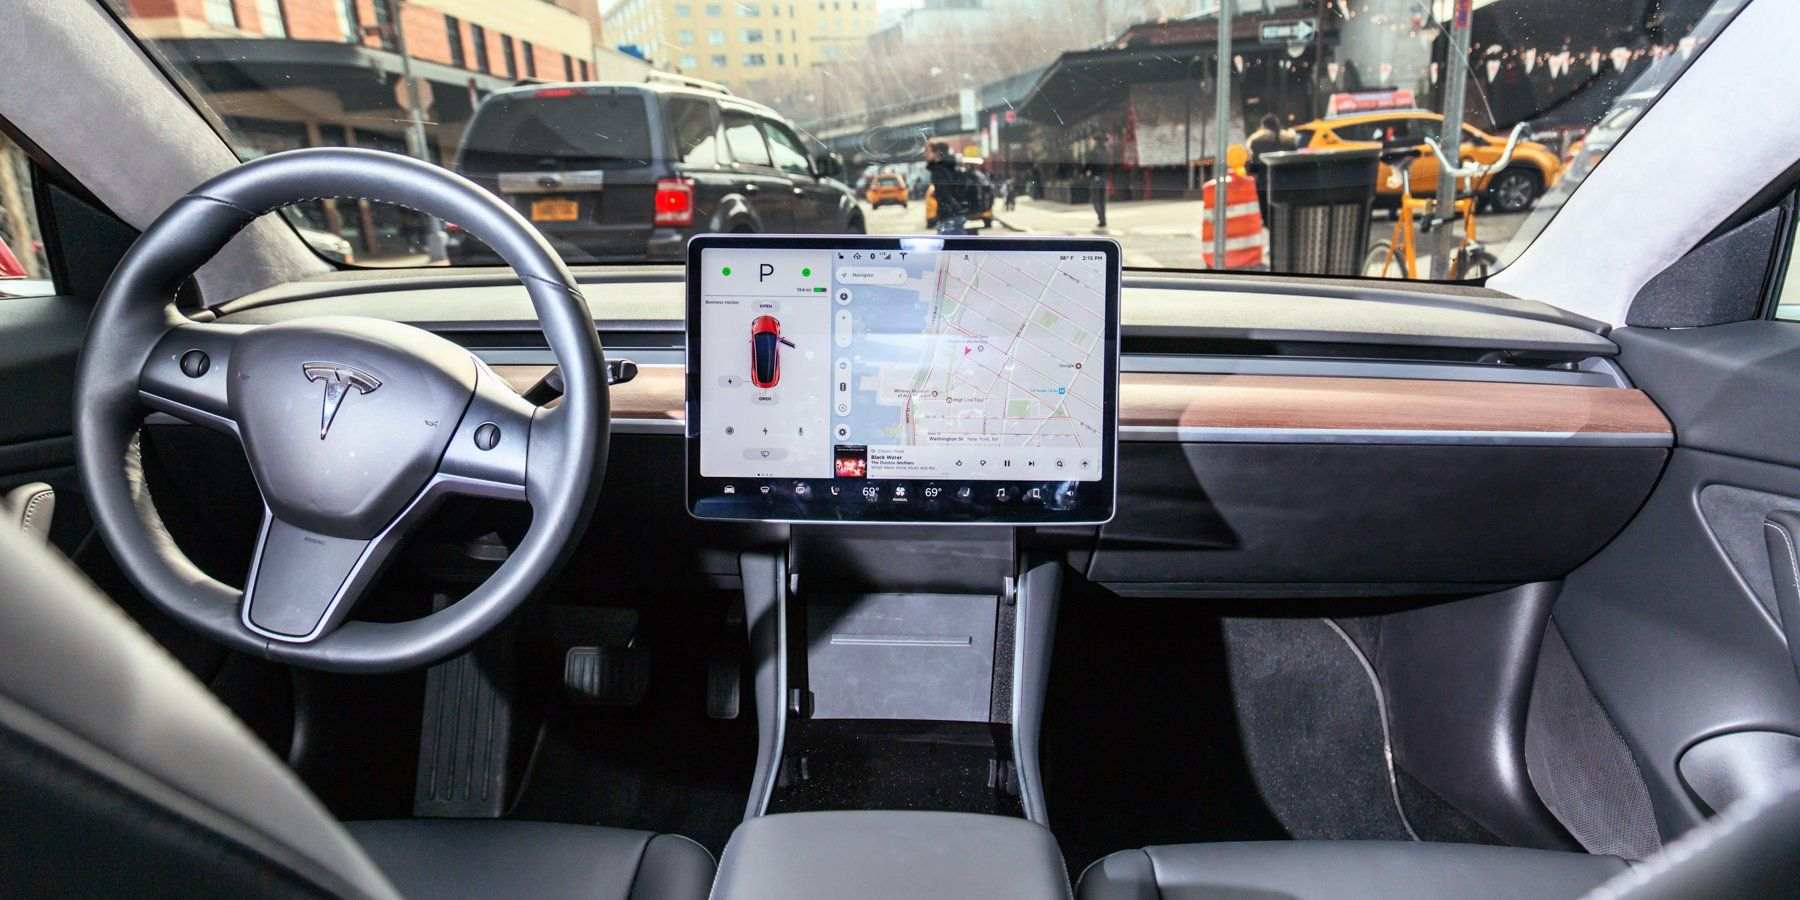 Tesla Electronics Easily A Winner But Could Be Too Centralized Tesla Interior Tesla Car Tesla Model